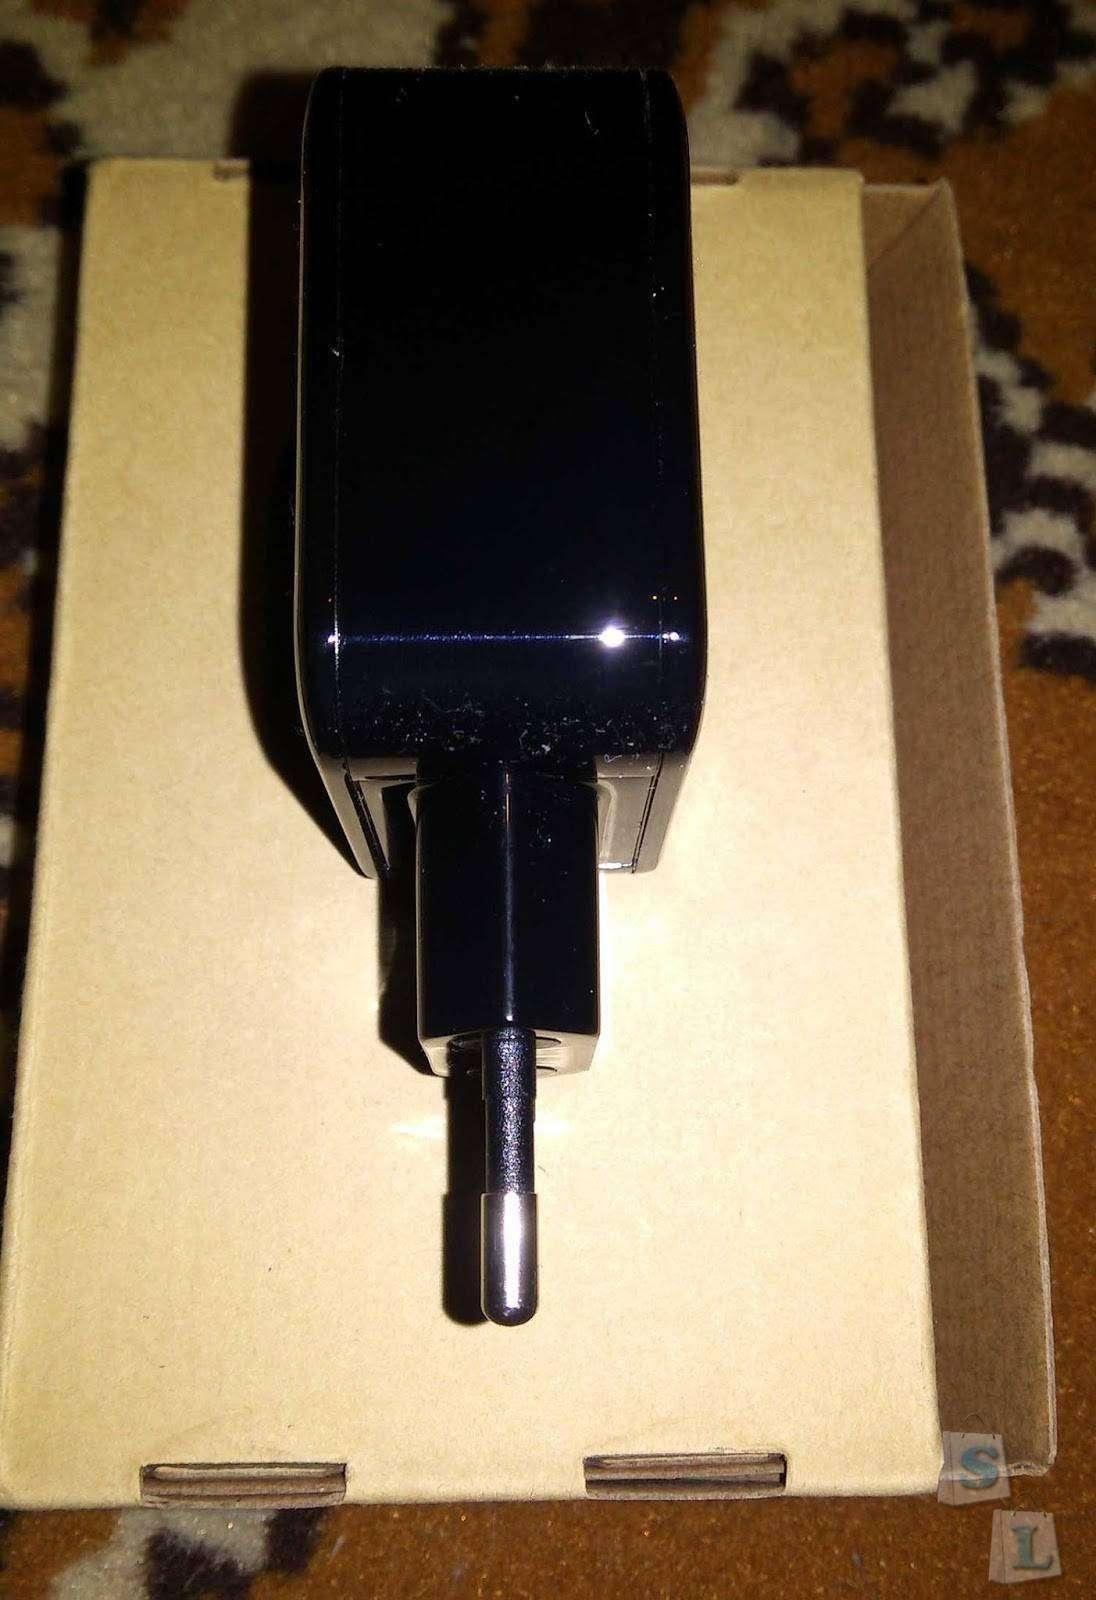 Banggood: Зарядка BlitzWolf на 2 USB порта с технологией Power3S